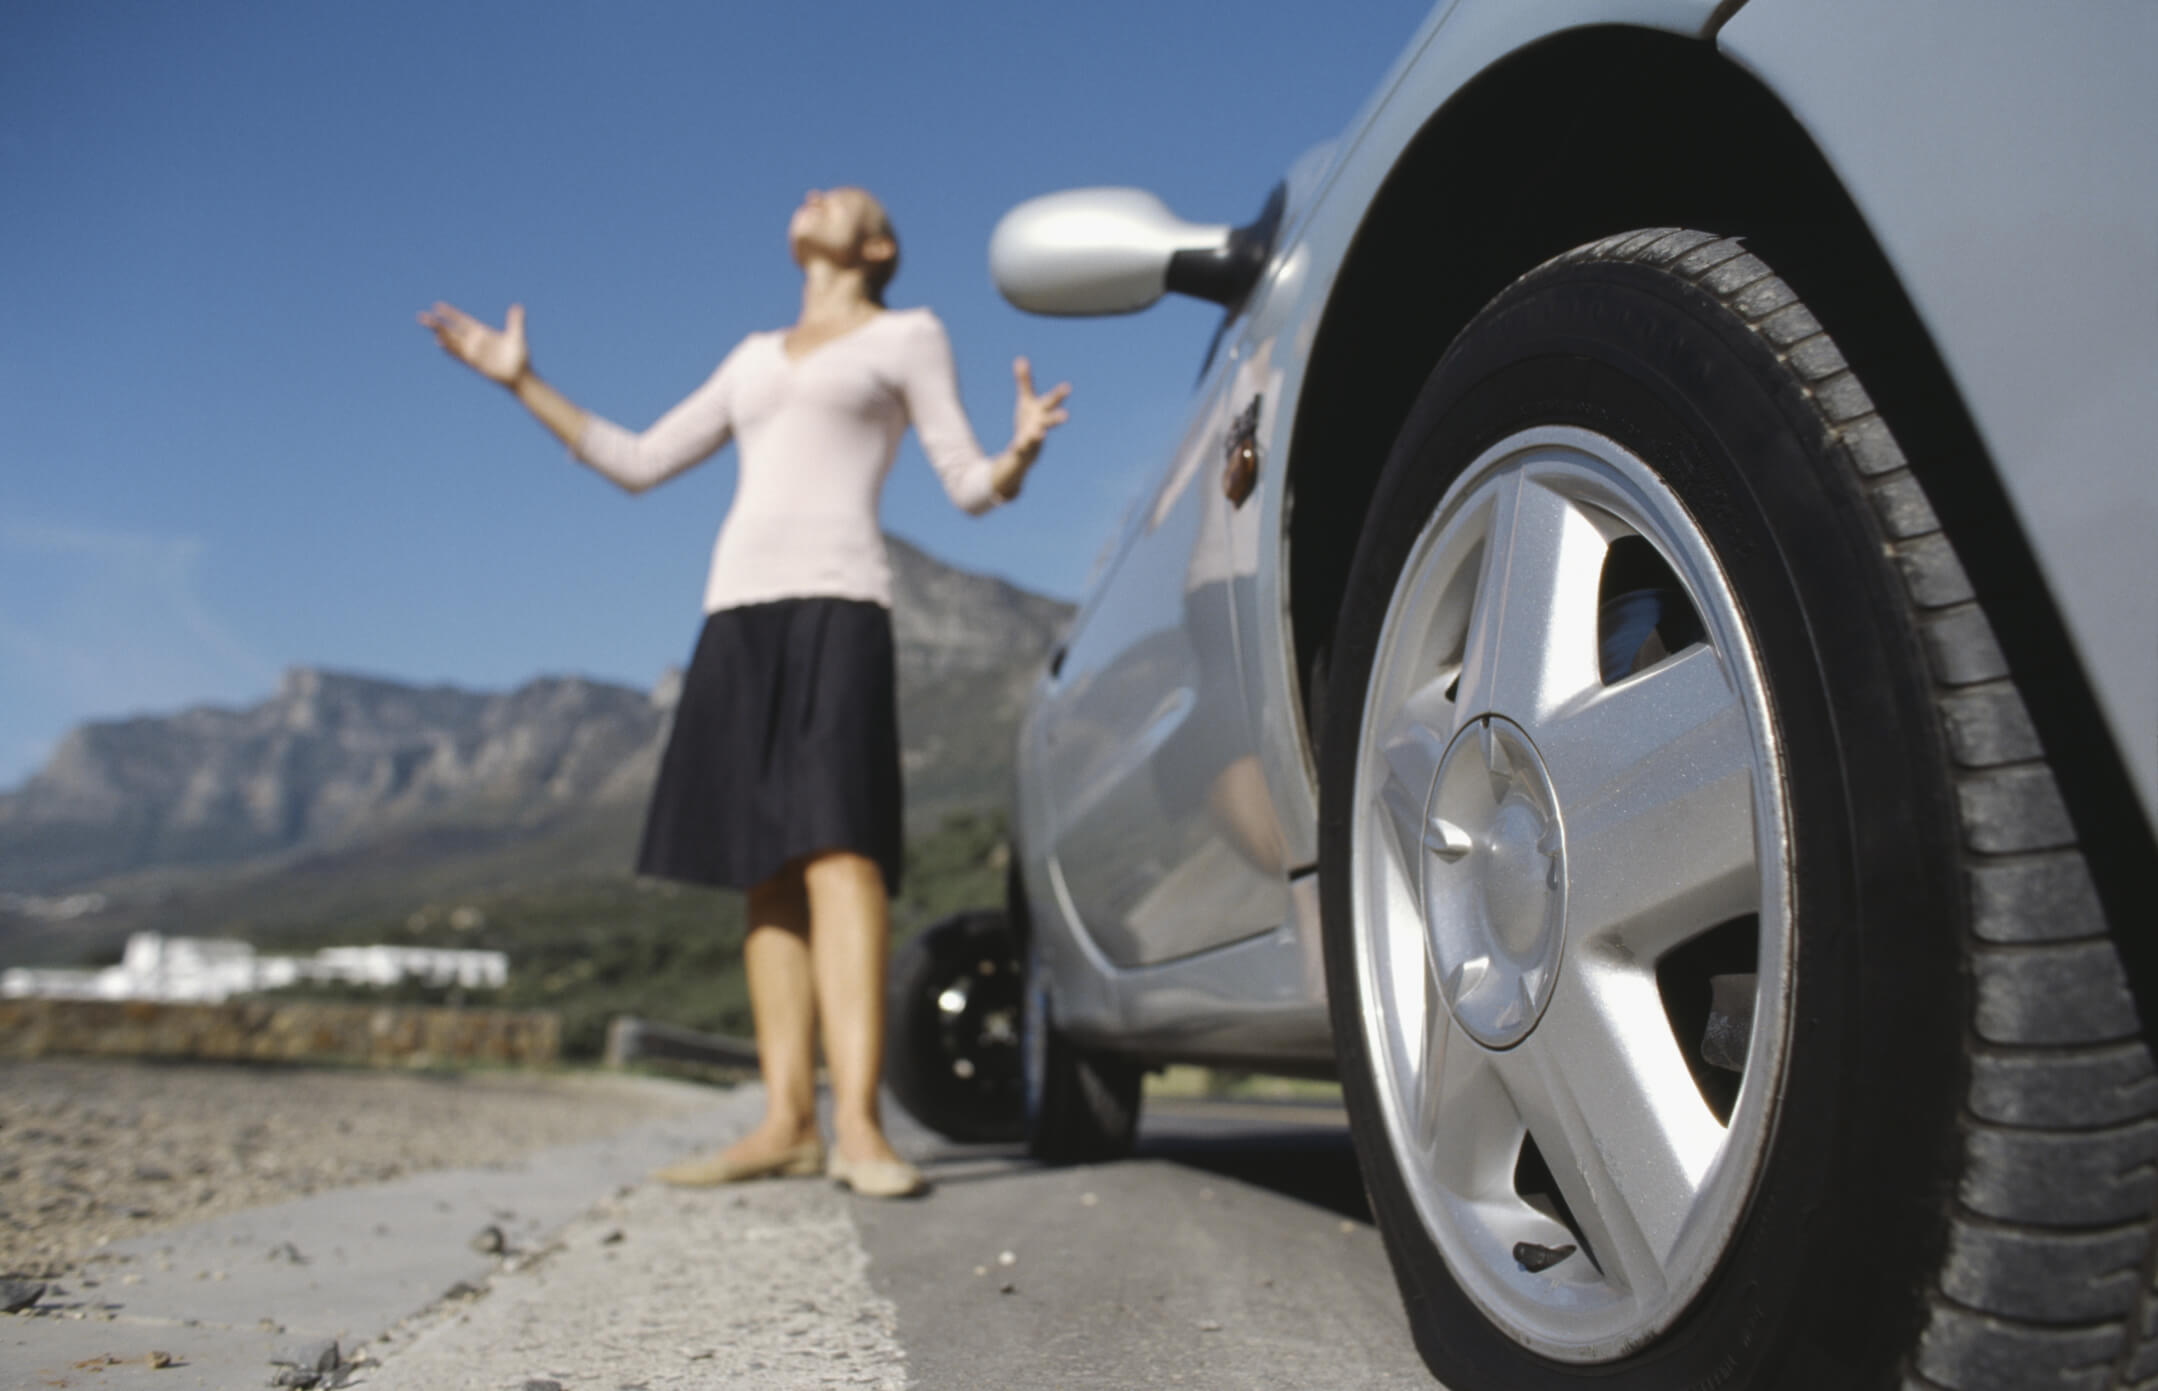 Mobile Mechanic Tulsa - Mobile Auto Repair Pros   OnSite Car Mechanic Shop